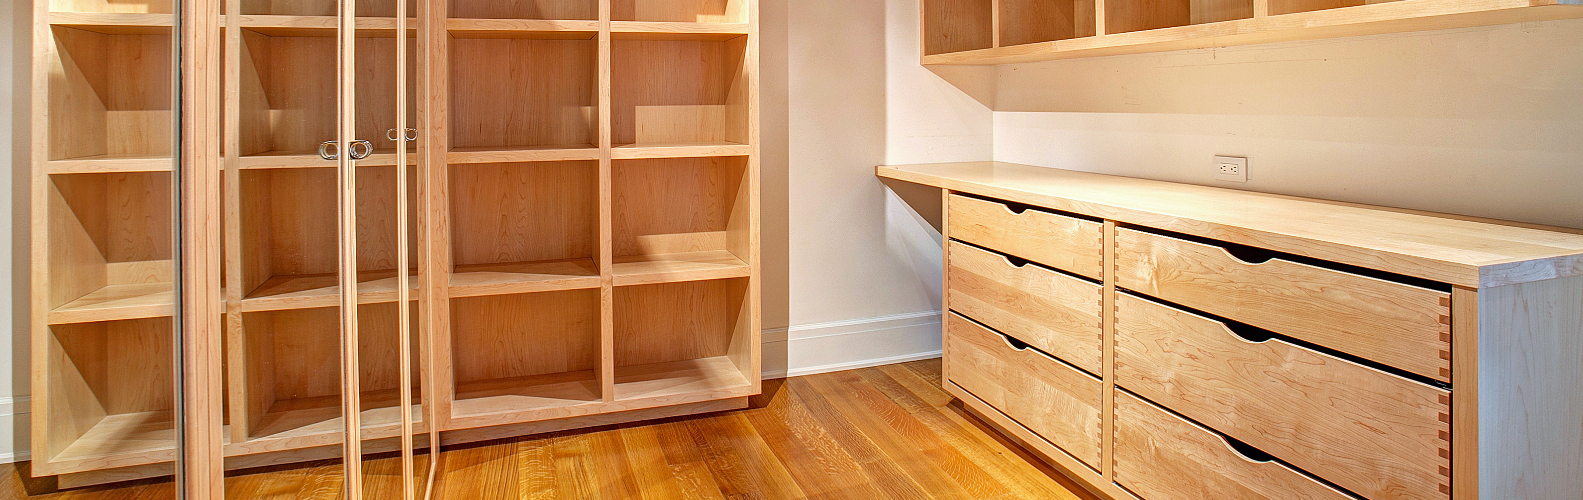 Idea Gallery - Closets & Pantries